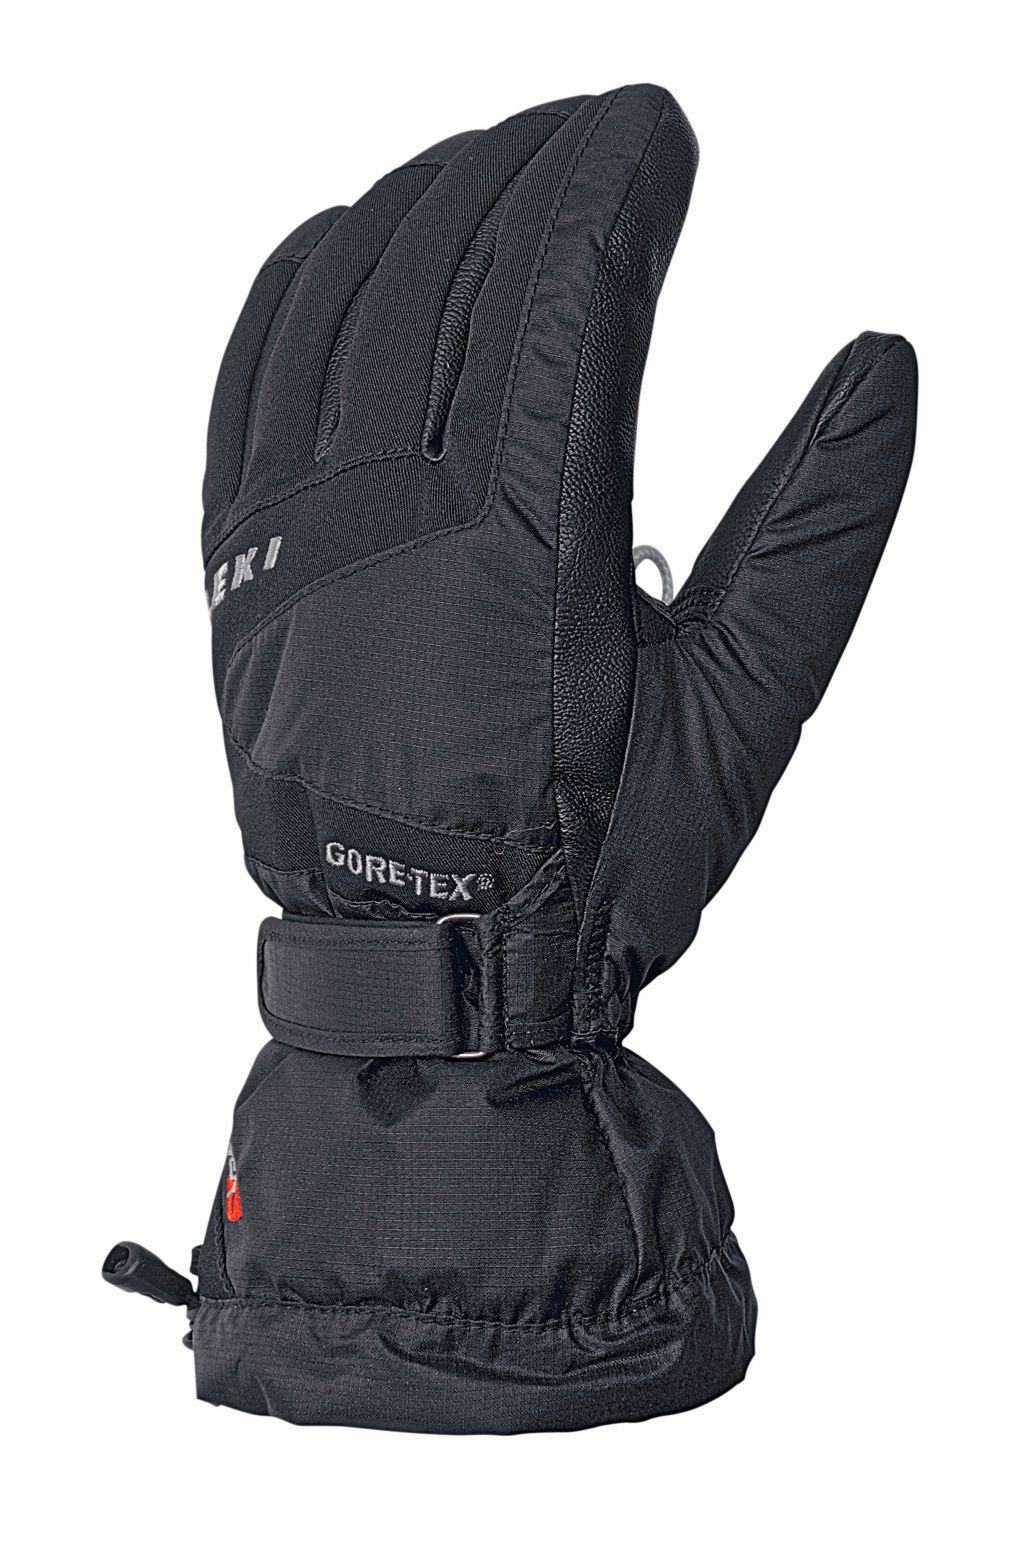 Scale S Skihandschuhe in schwarz, Größe 11